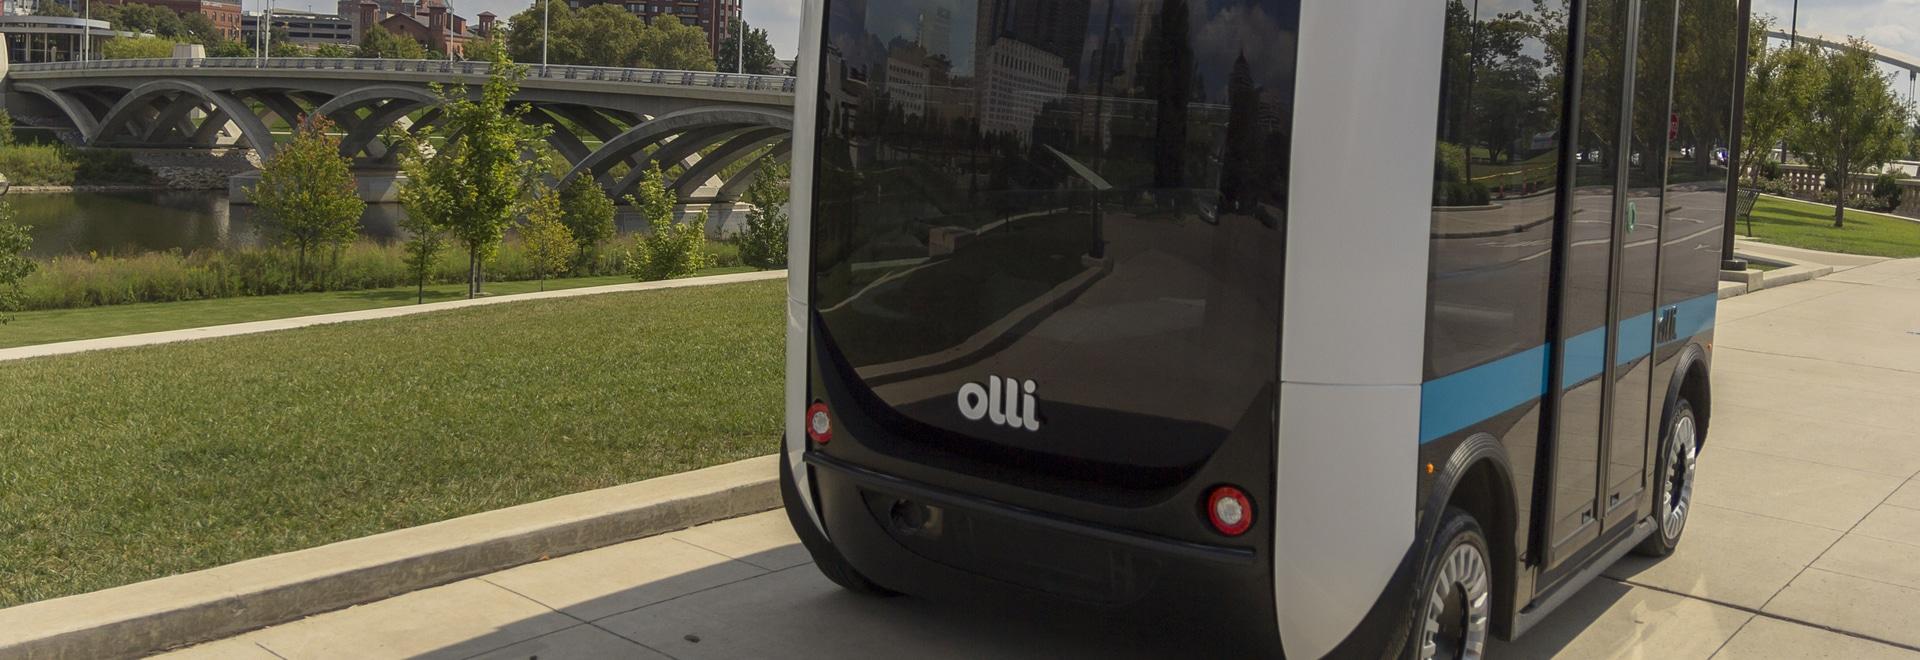 Olli, a 3D printed autonomous shuttle debuts at Sacramento State University